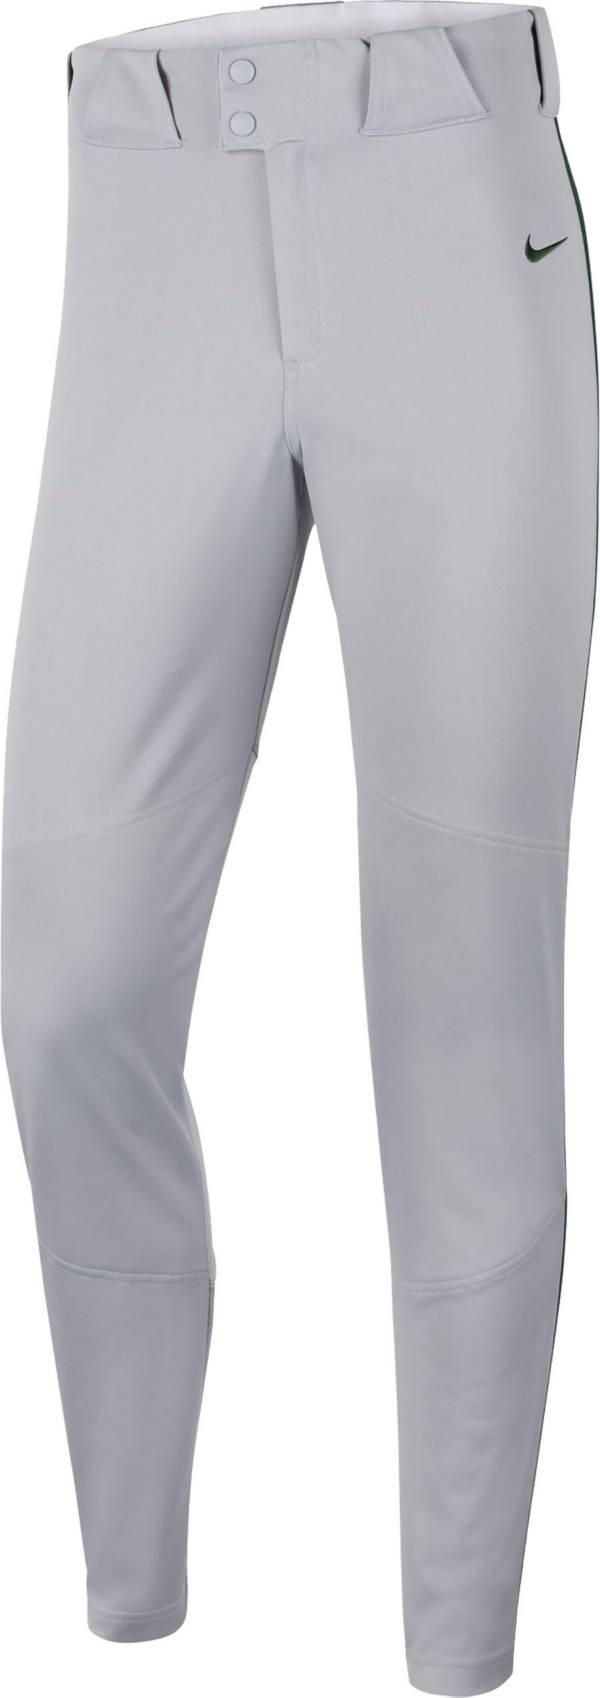 Nike Men's Vapor Select Piped Baseball Pants product image